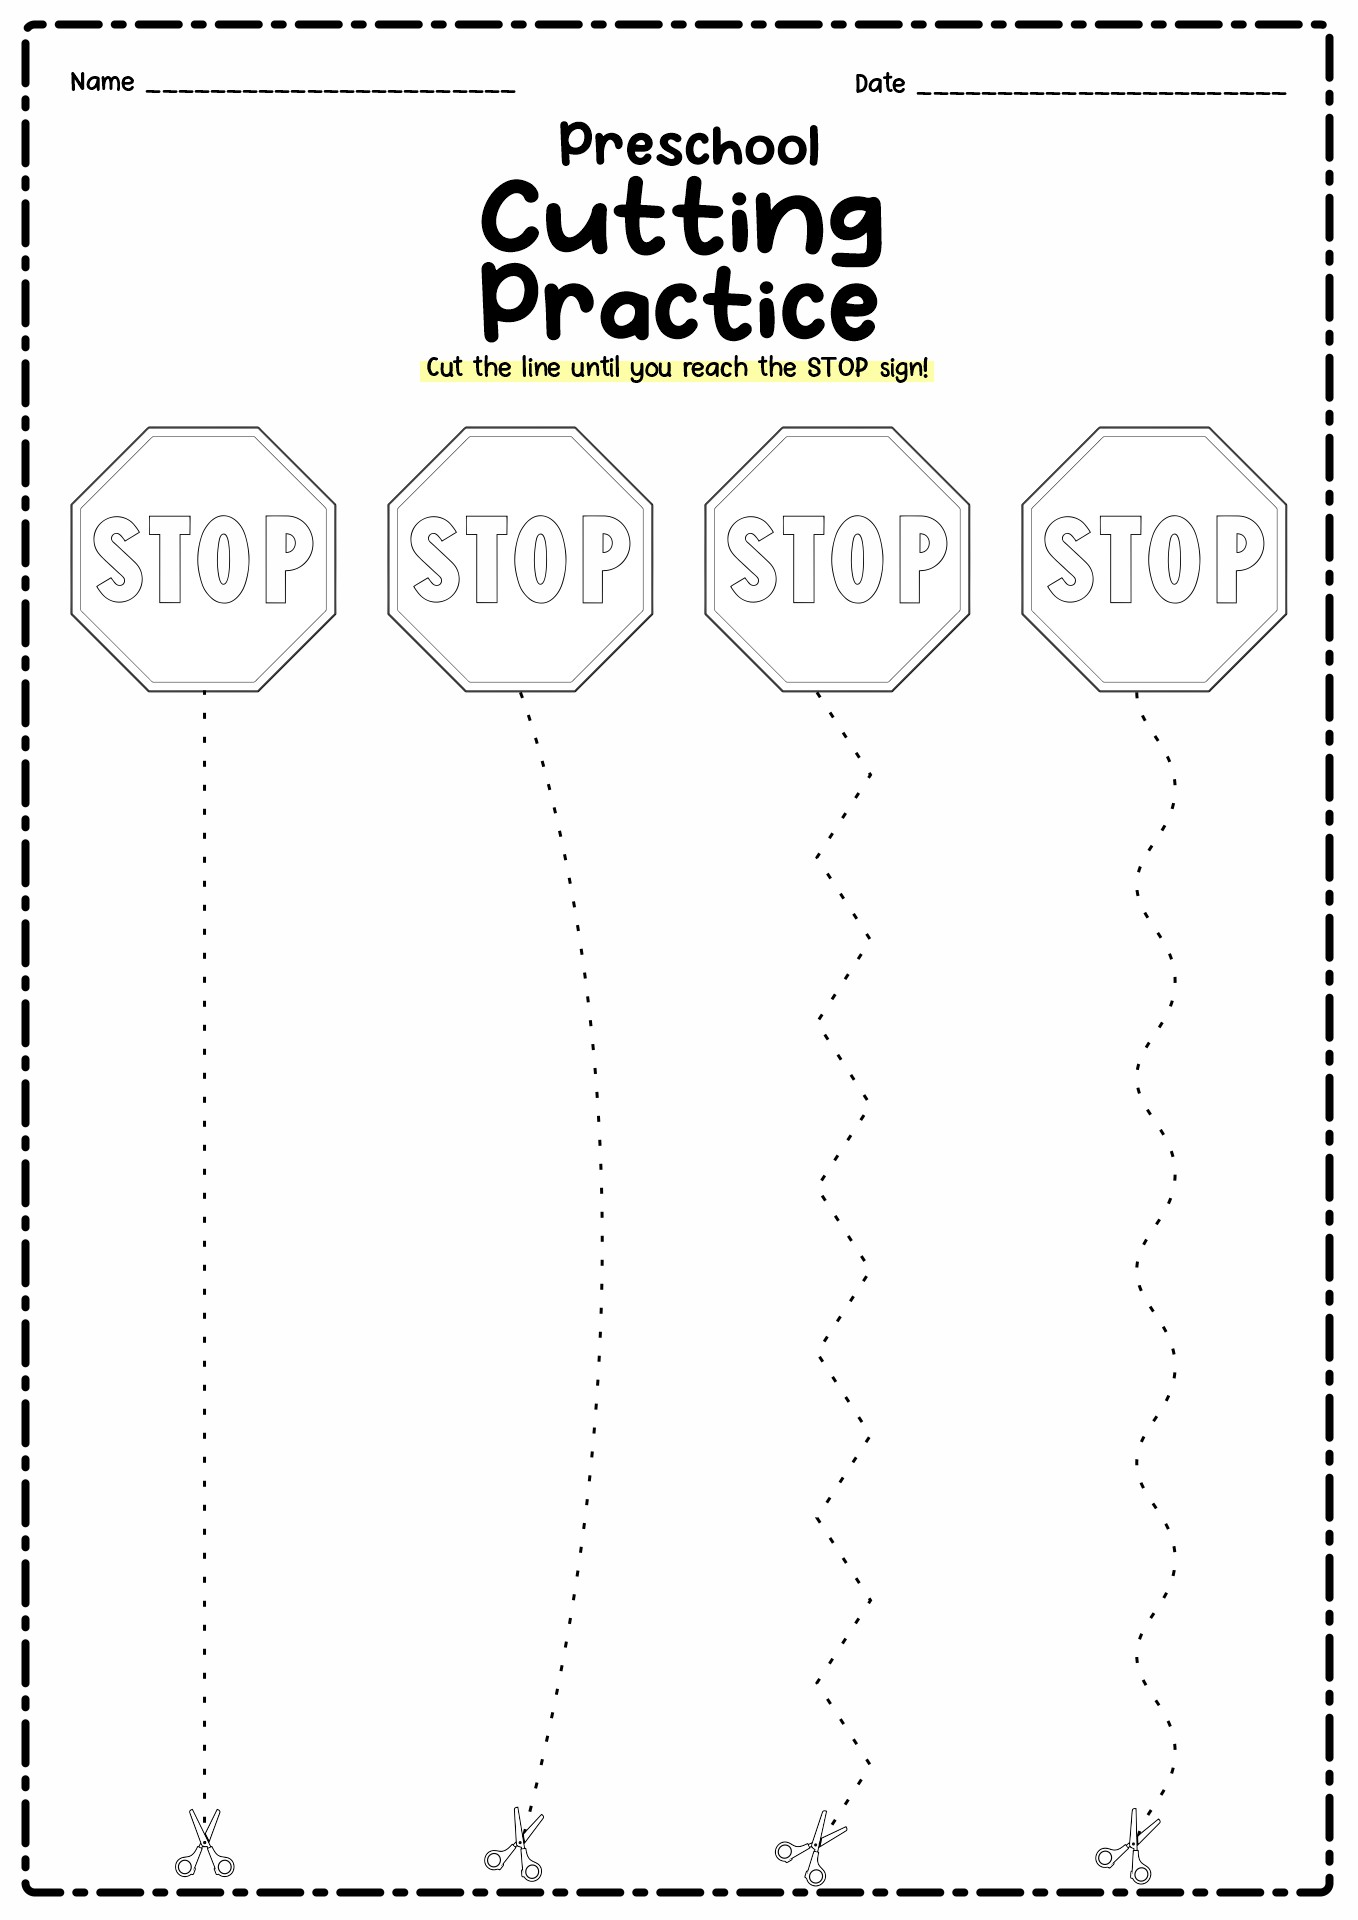 13 Best Images Of Preschool Worksheets Cutting Practice